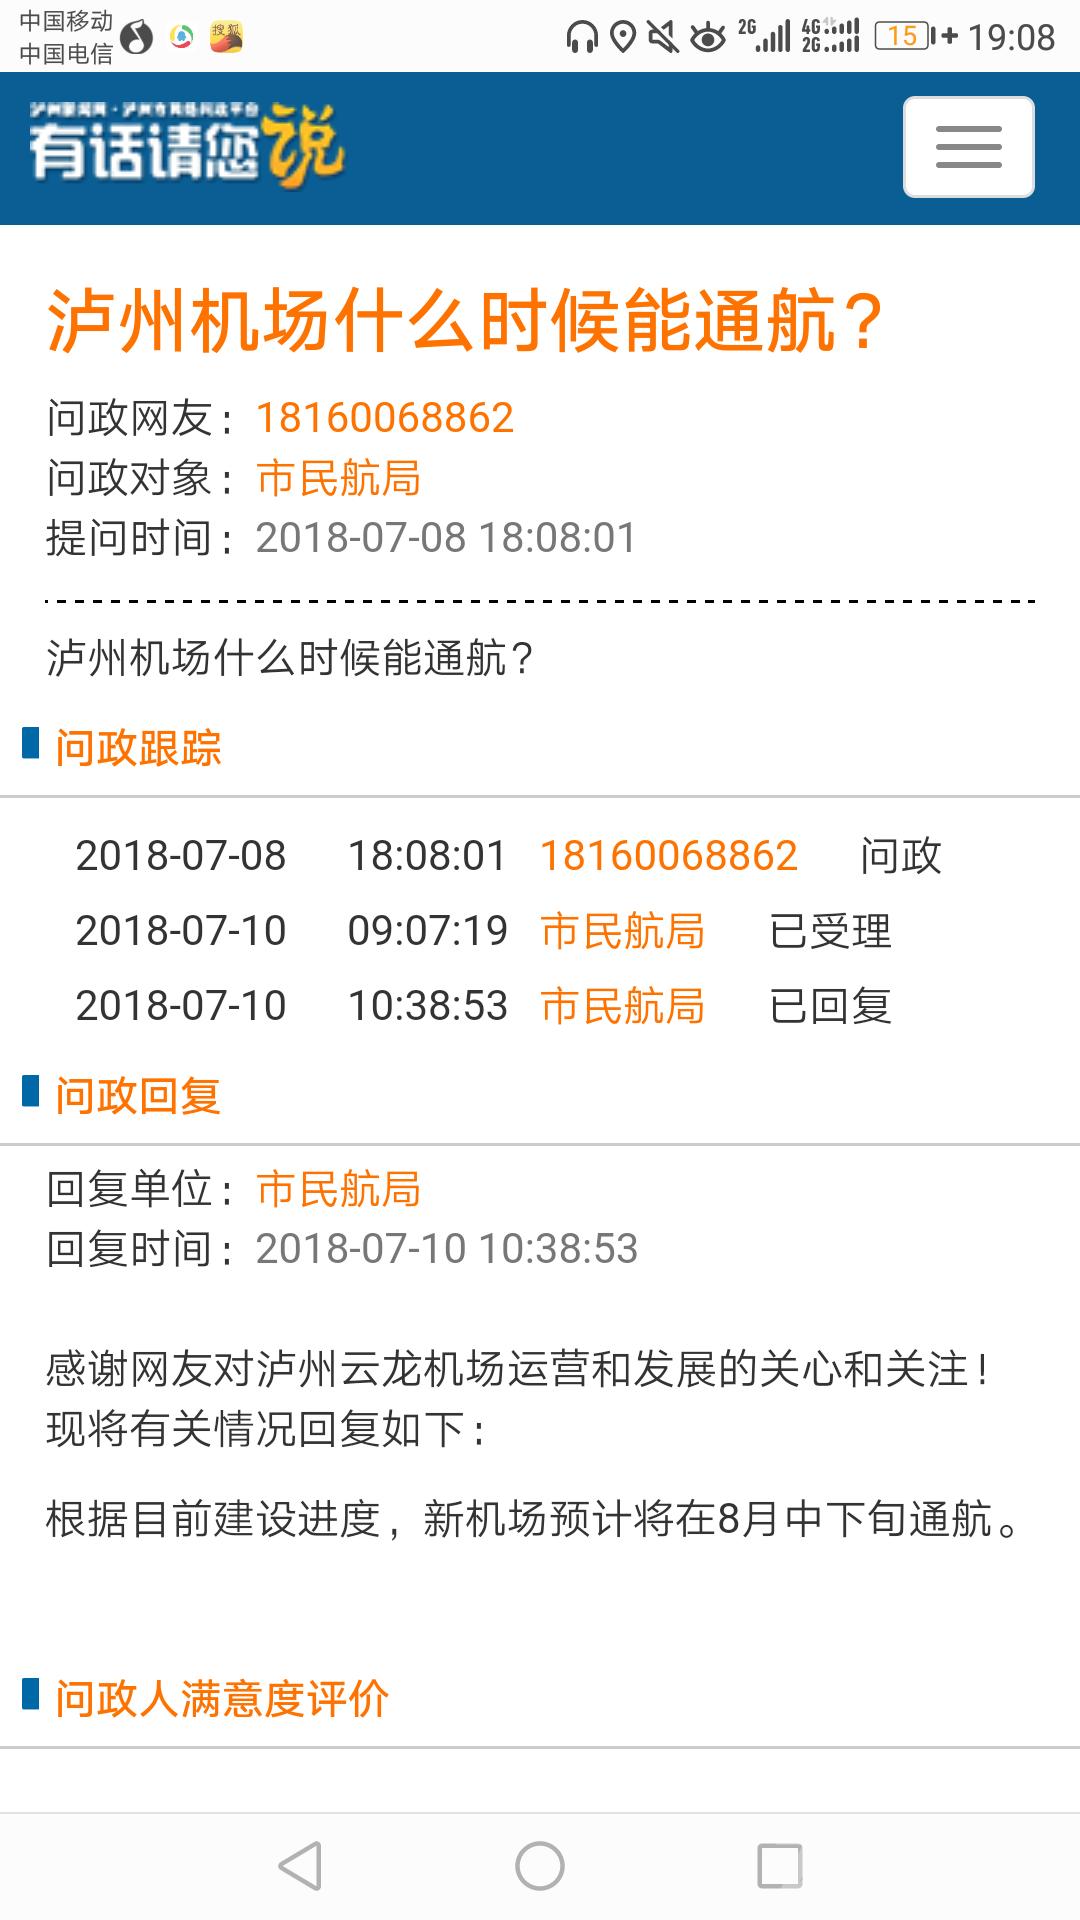 Screenshot_20180710-190826.png